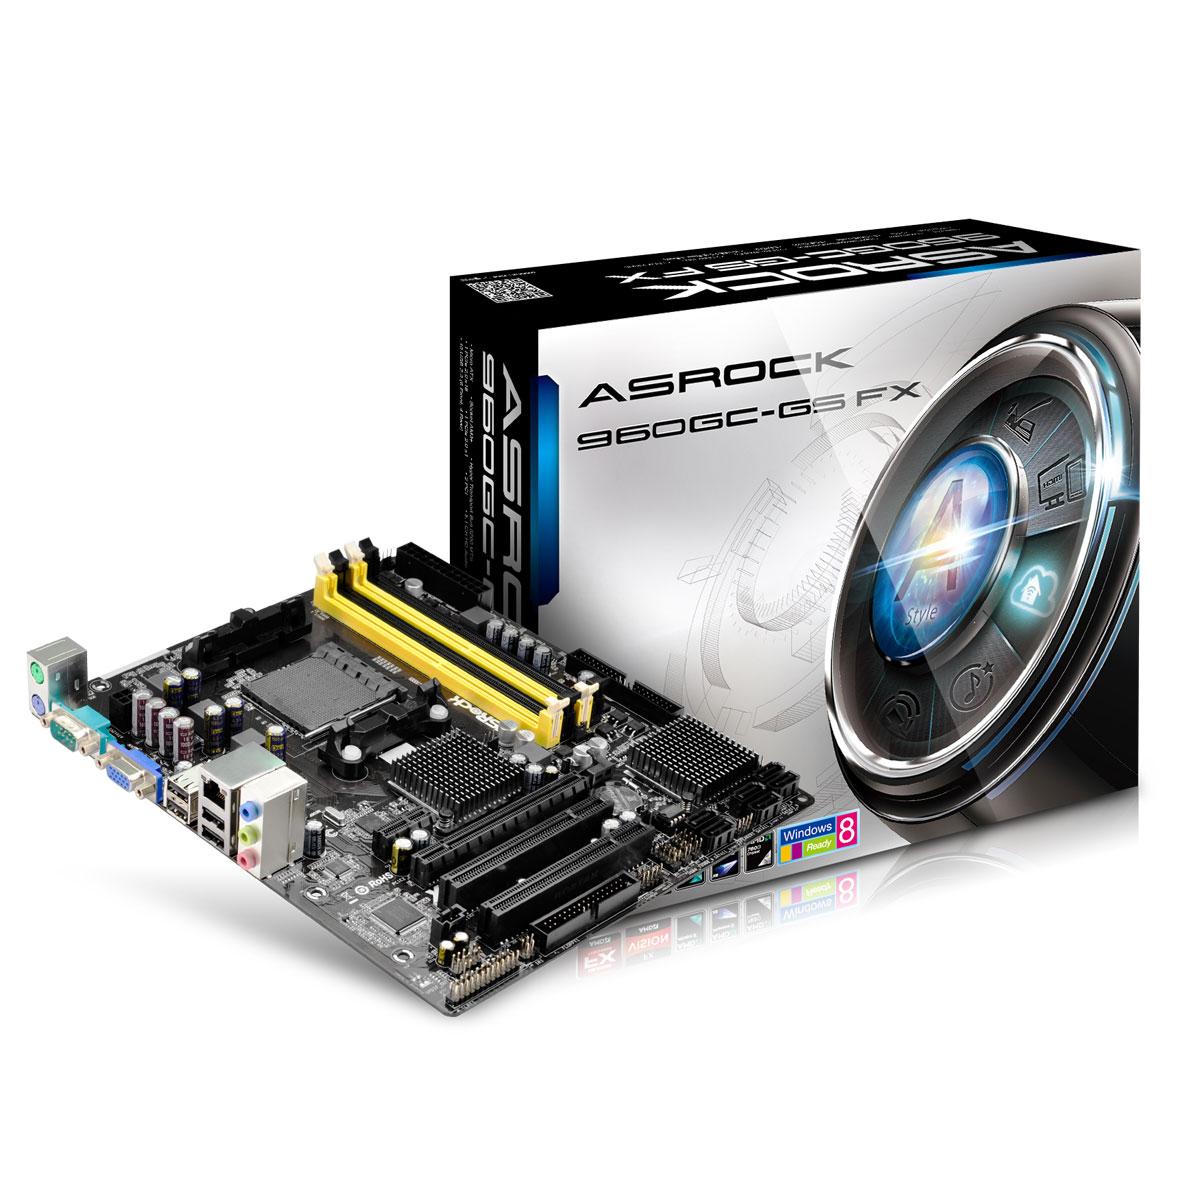 Carte mère ASRock 960GC-GS FX Carte mère Micro ATX Socket AM3/AM3+ AMD Radeon 3000 Vidéo intégrée - SATA II 3Gb/s - USB 2.0